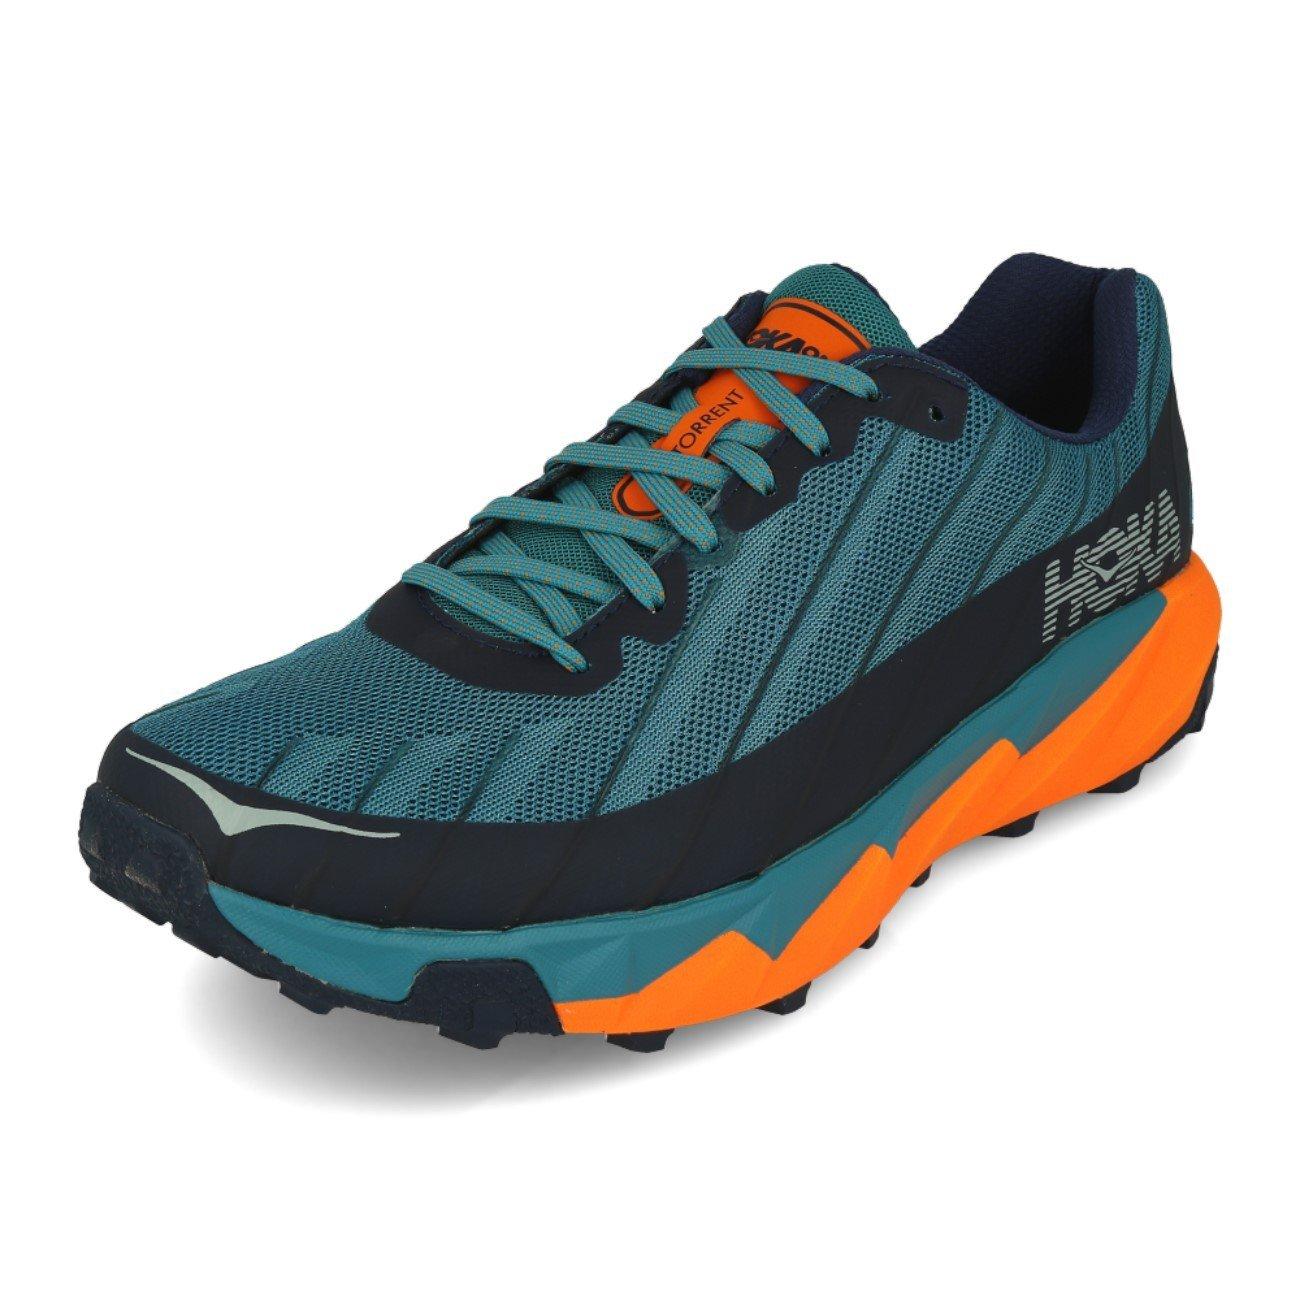 Hoka One One Torrent Storm Blue Black Iris: Amazon.co.uk: Shoes & Bags